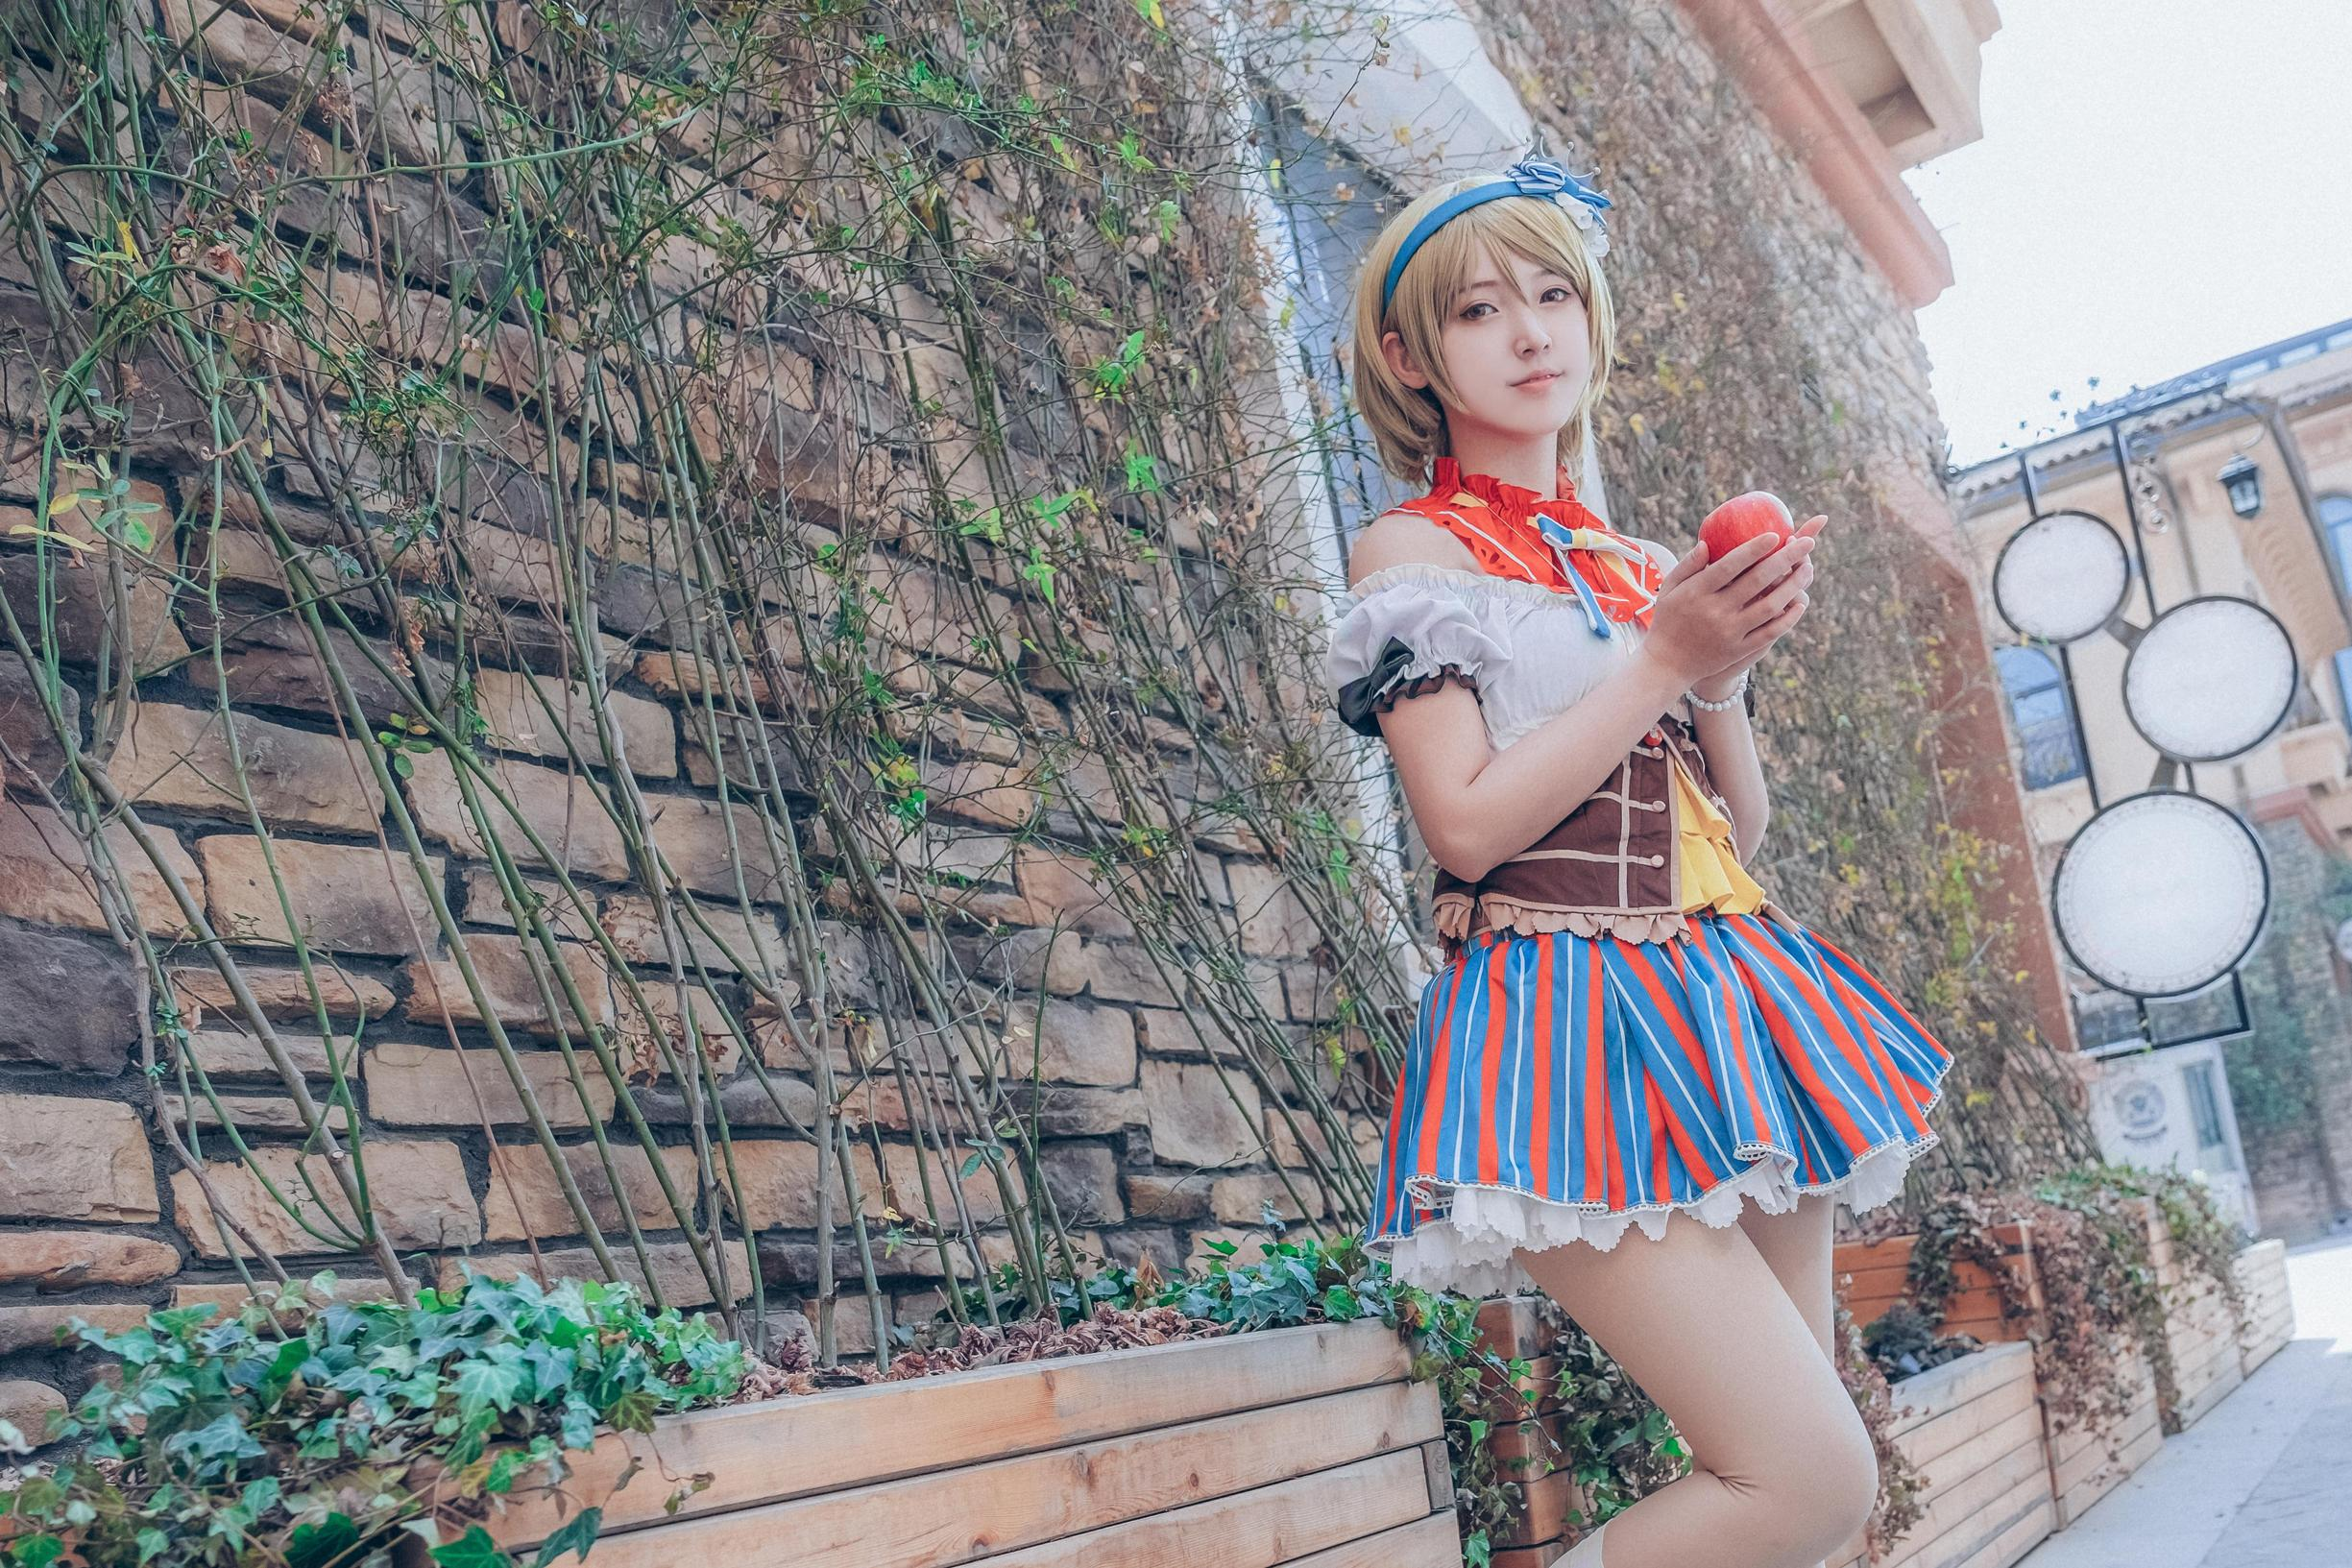 《LOVE LIVE!》正片cosplay【CN:辰苏】-第7张